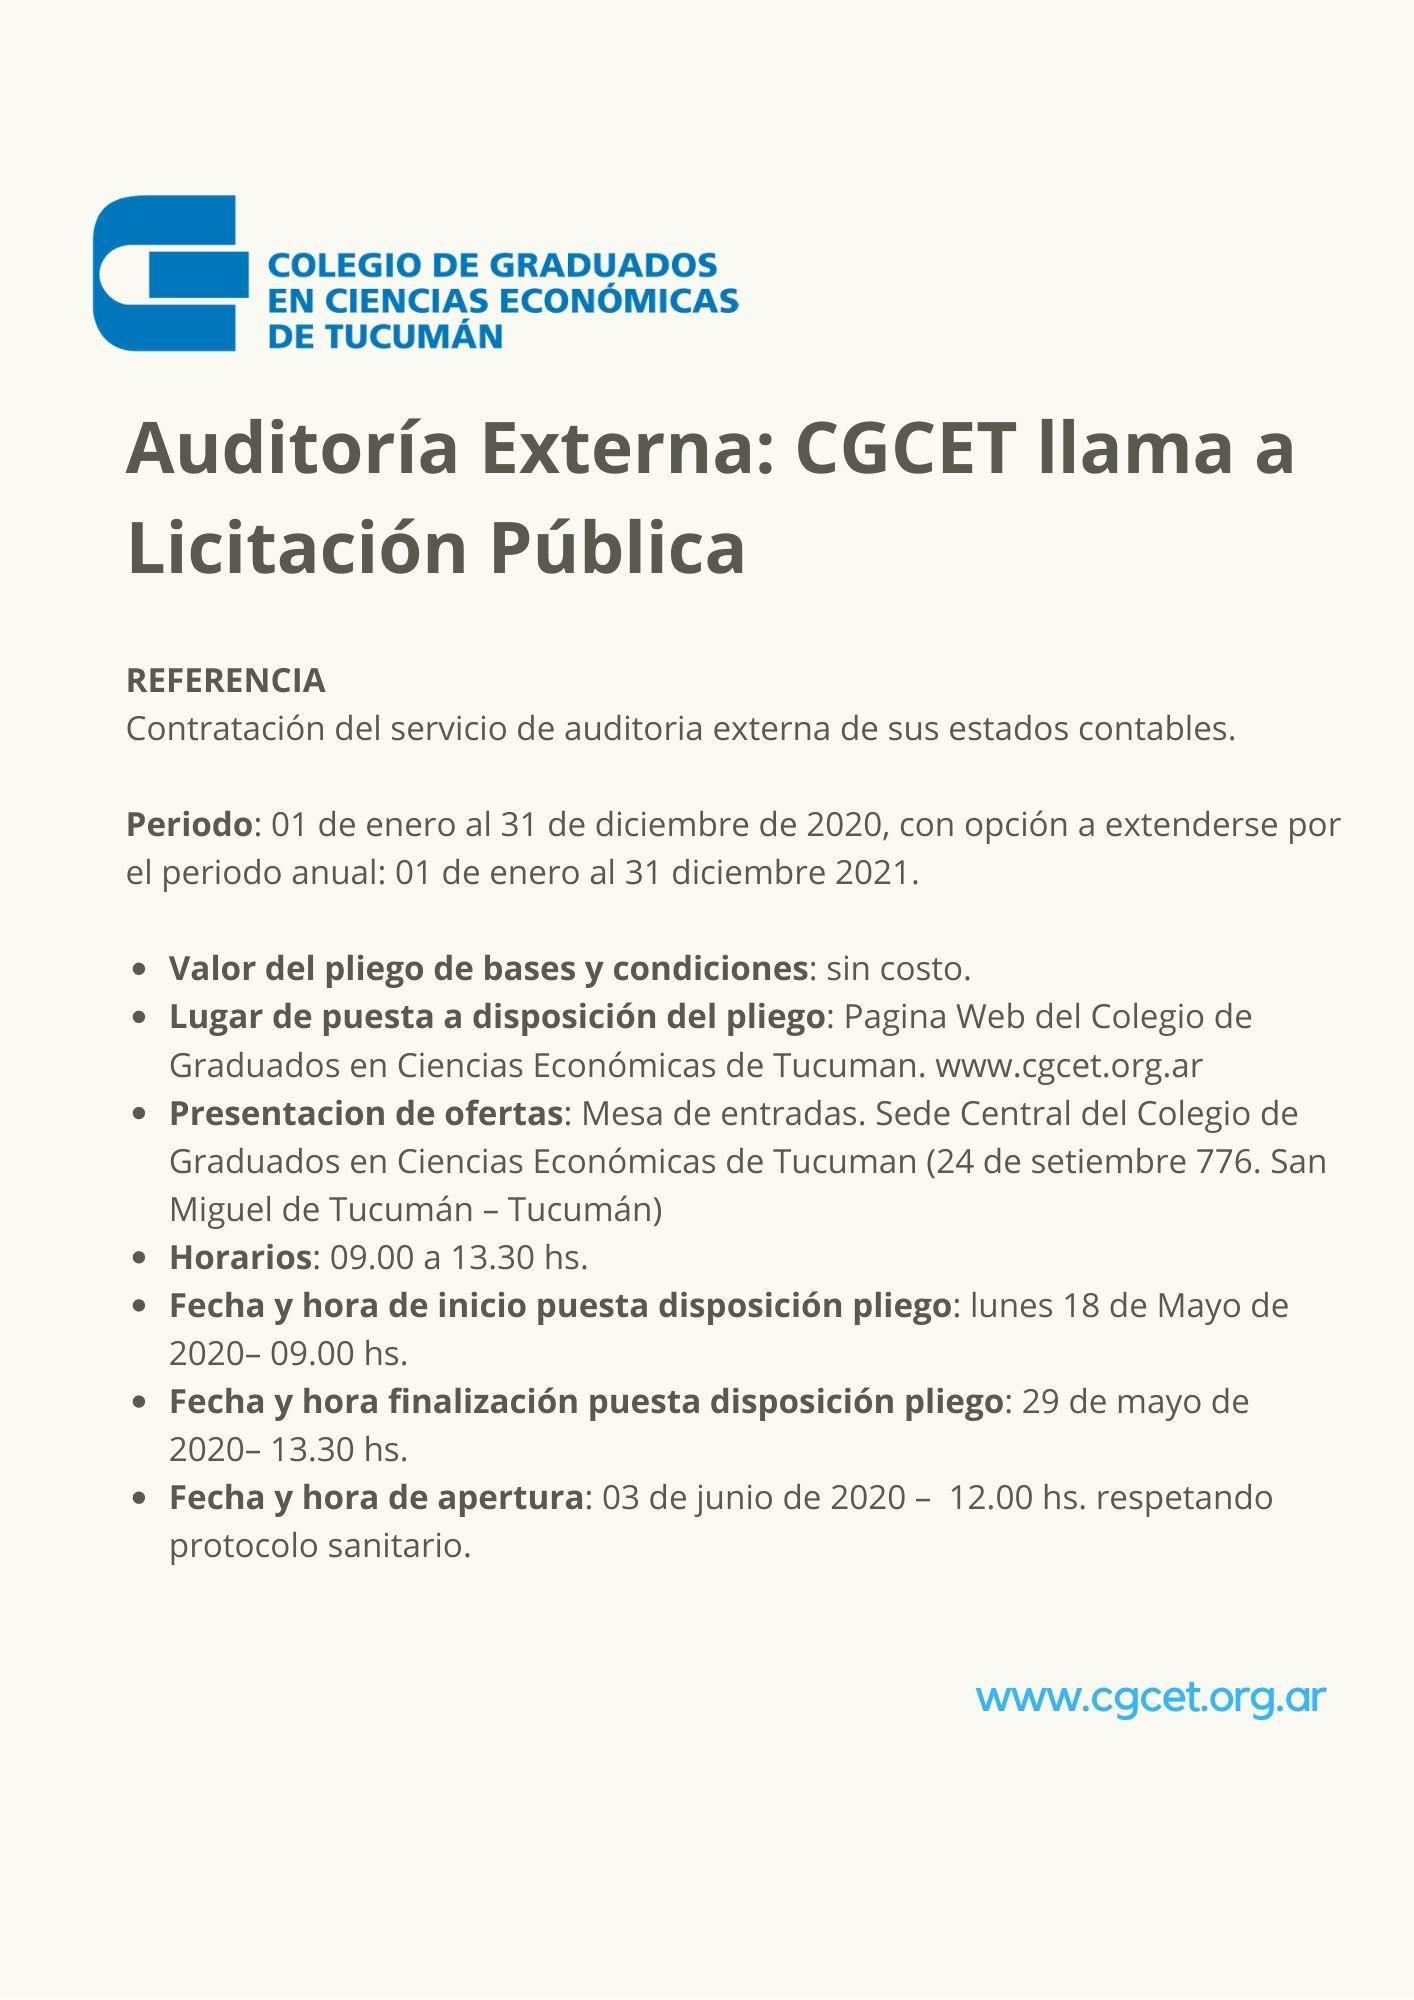 Auditoría Externa_ CGCET llama a Licitación Pública